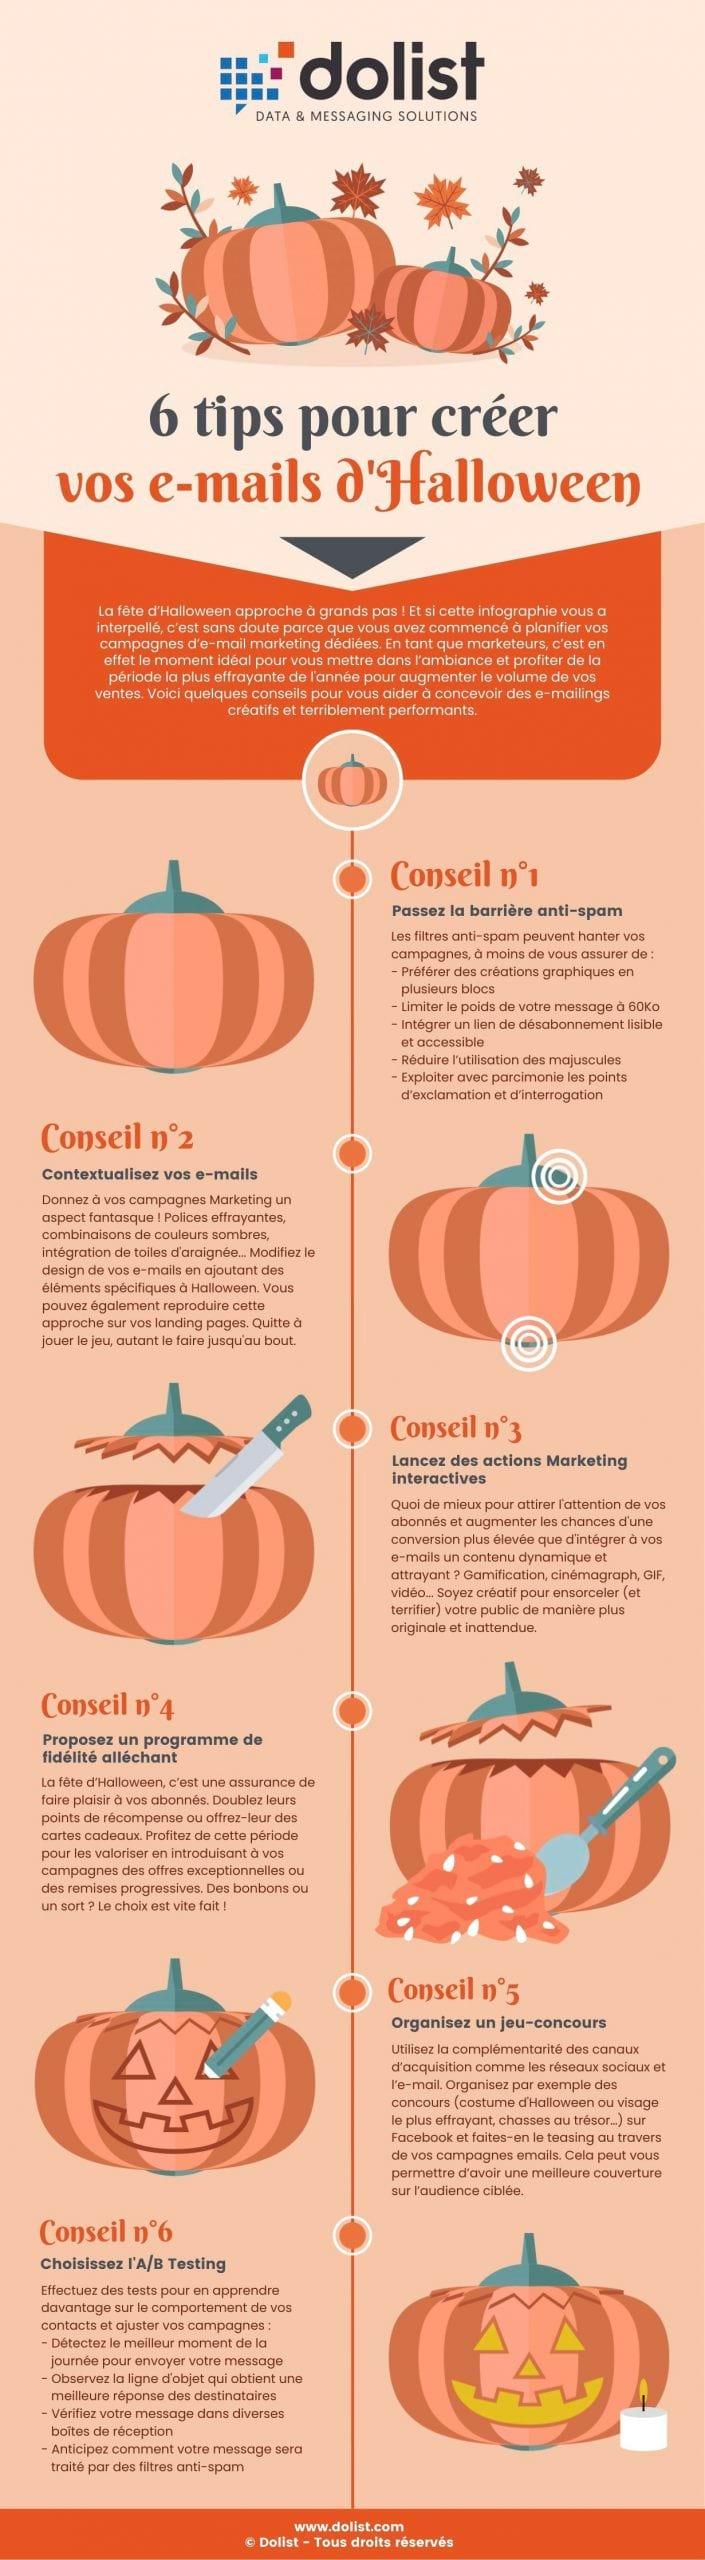 Infographie 6 tips pour créer vos emails d'Halloween